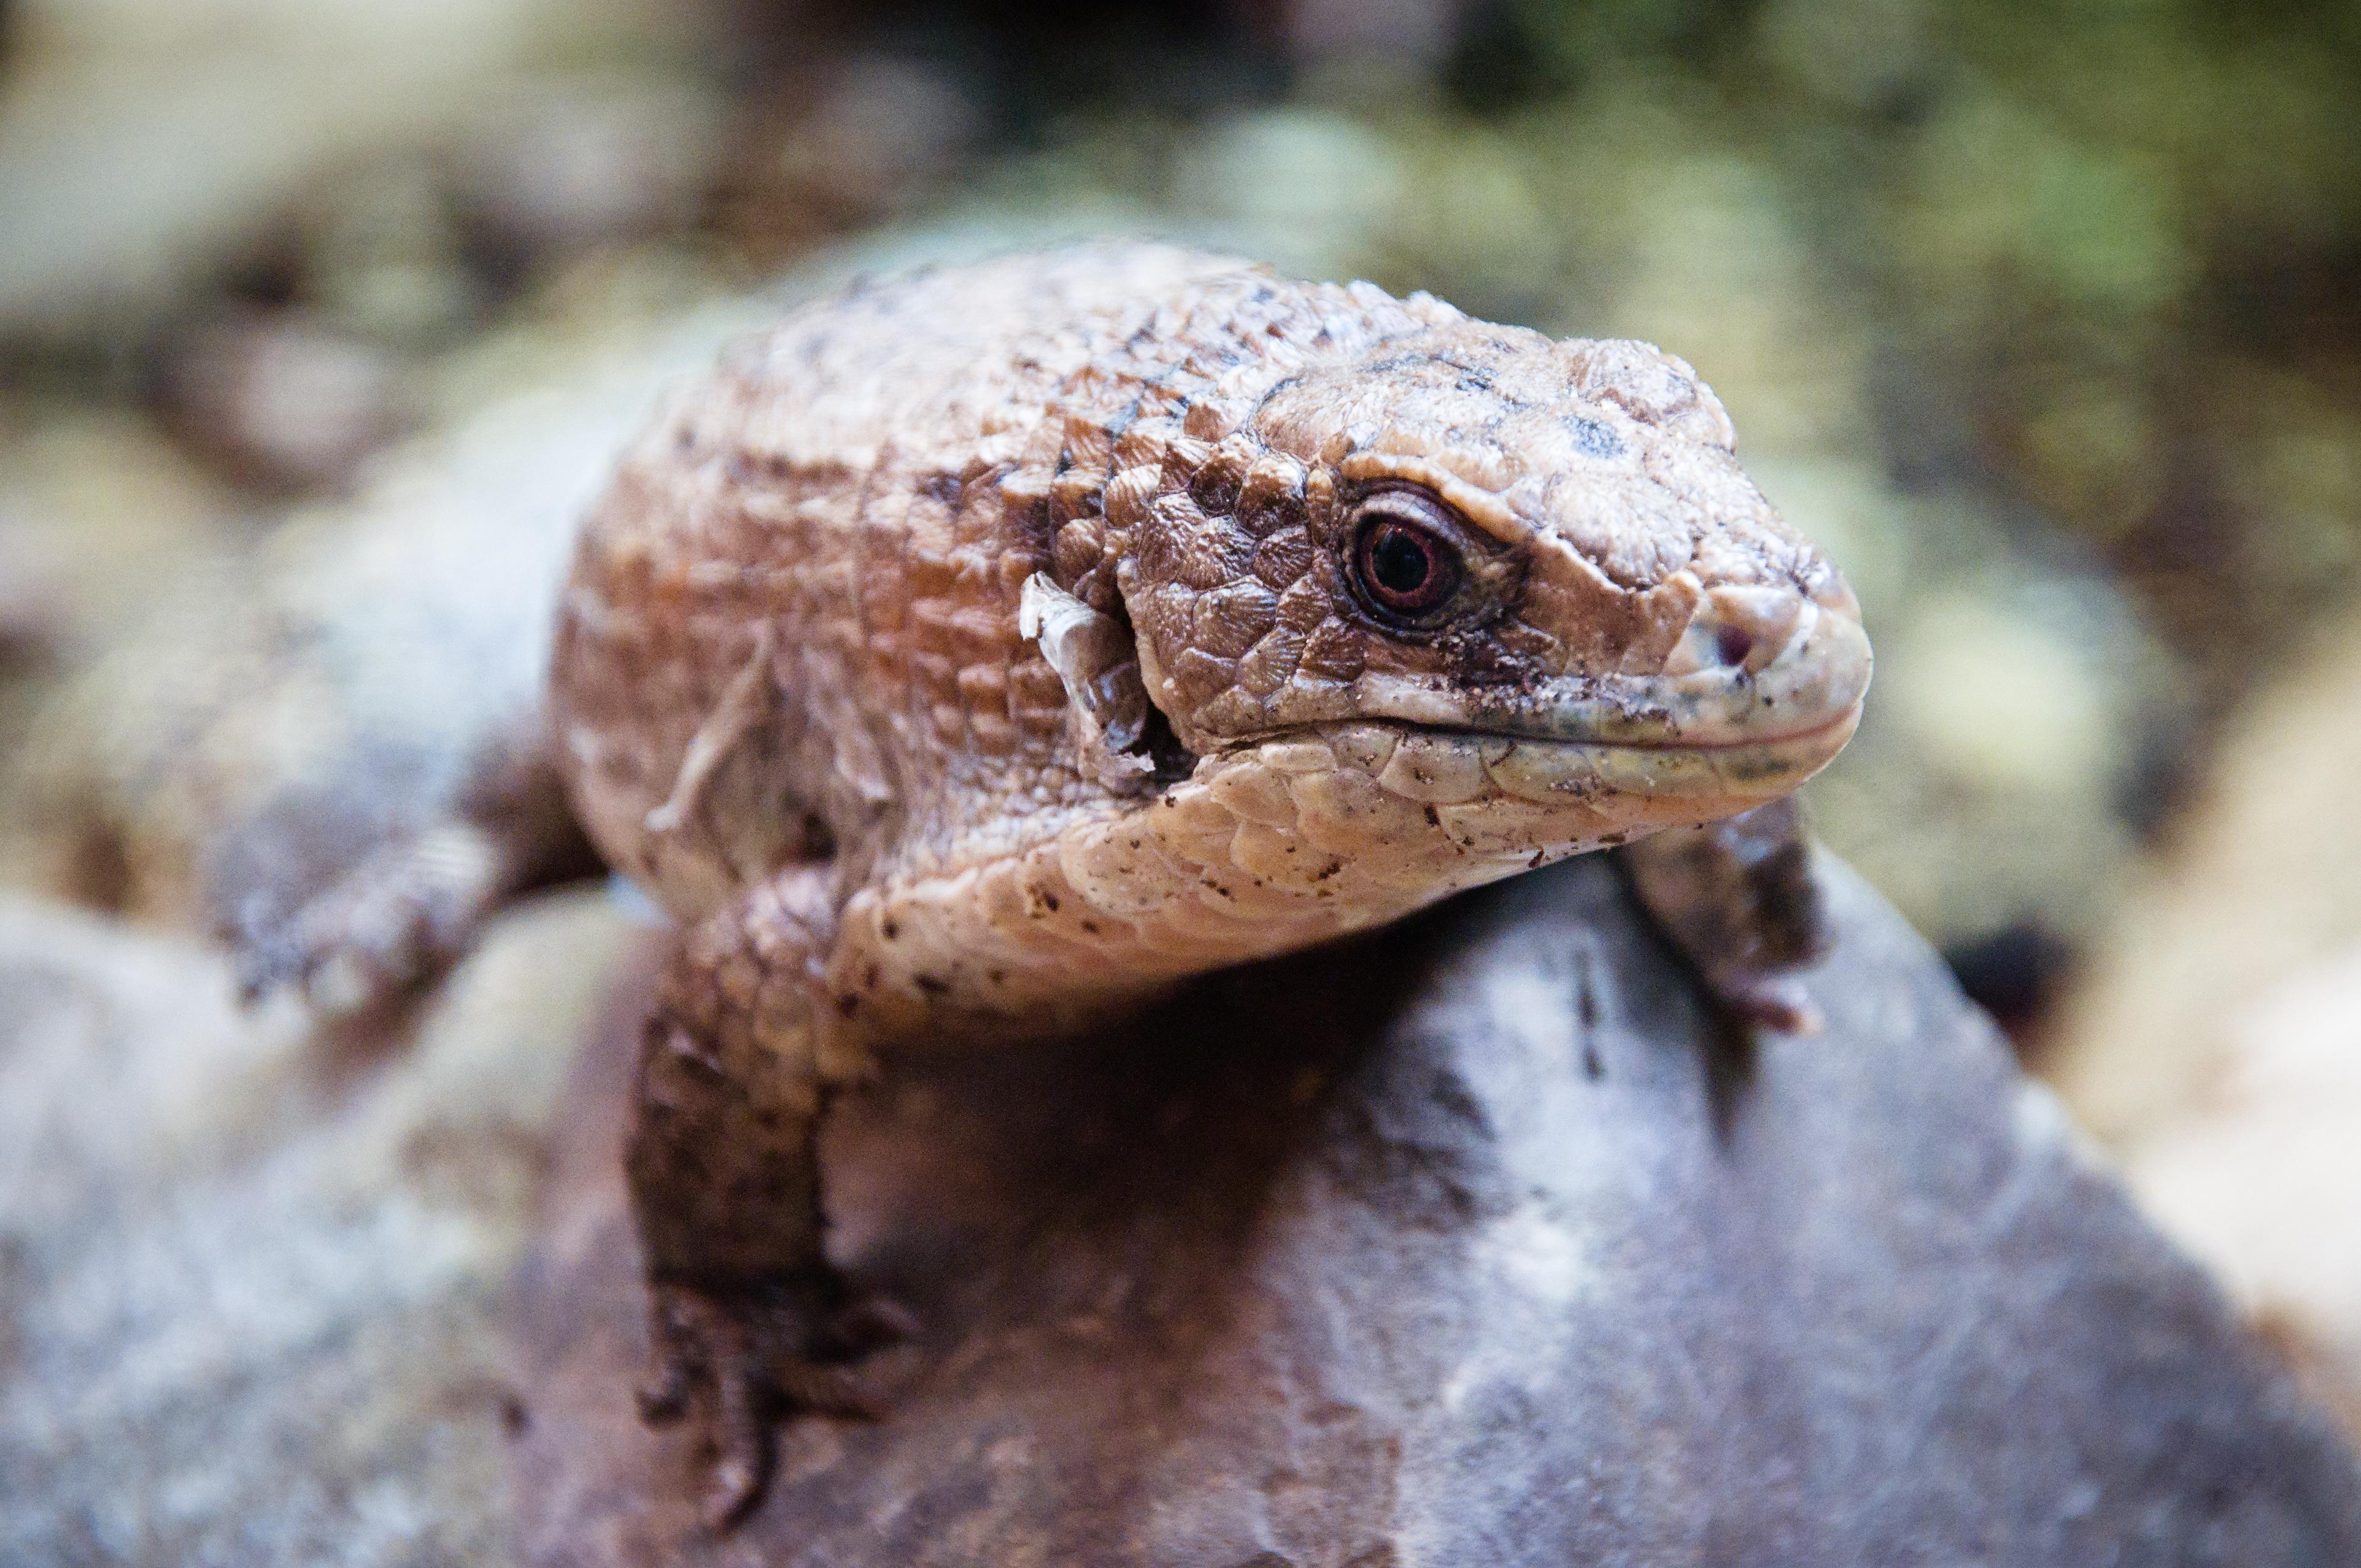 A close up of a lizard photo